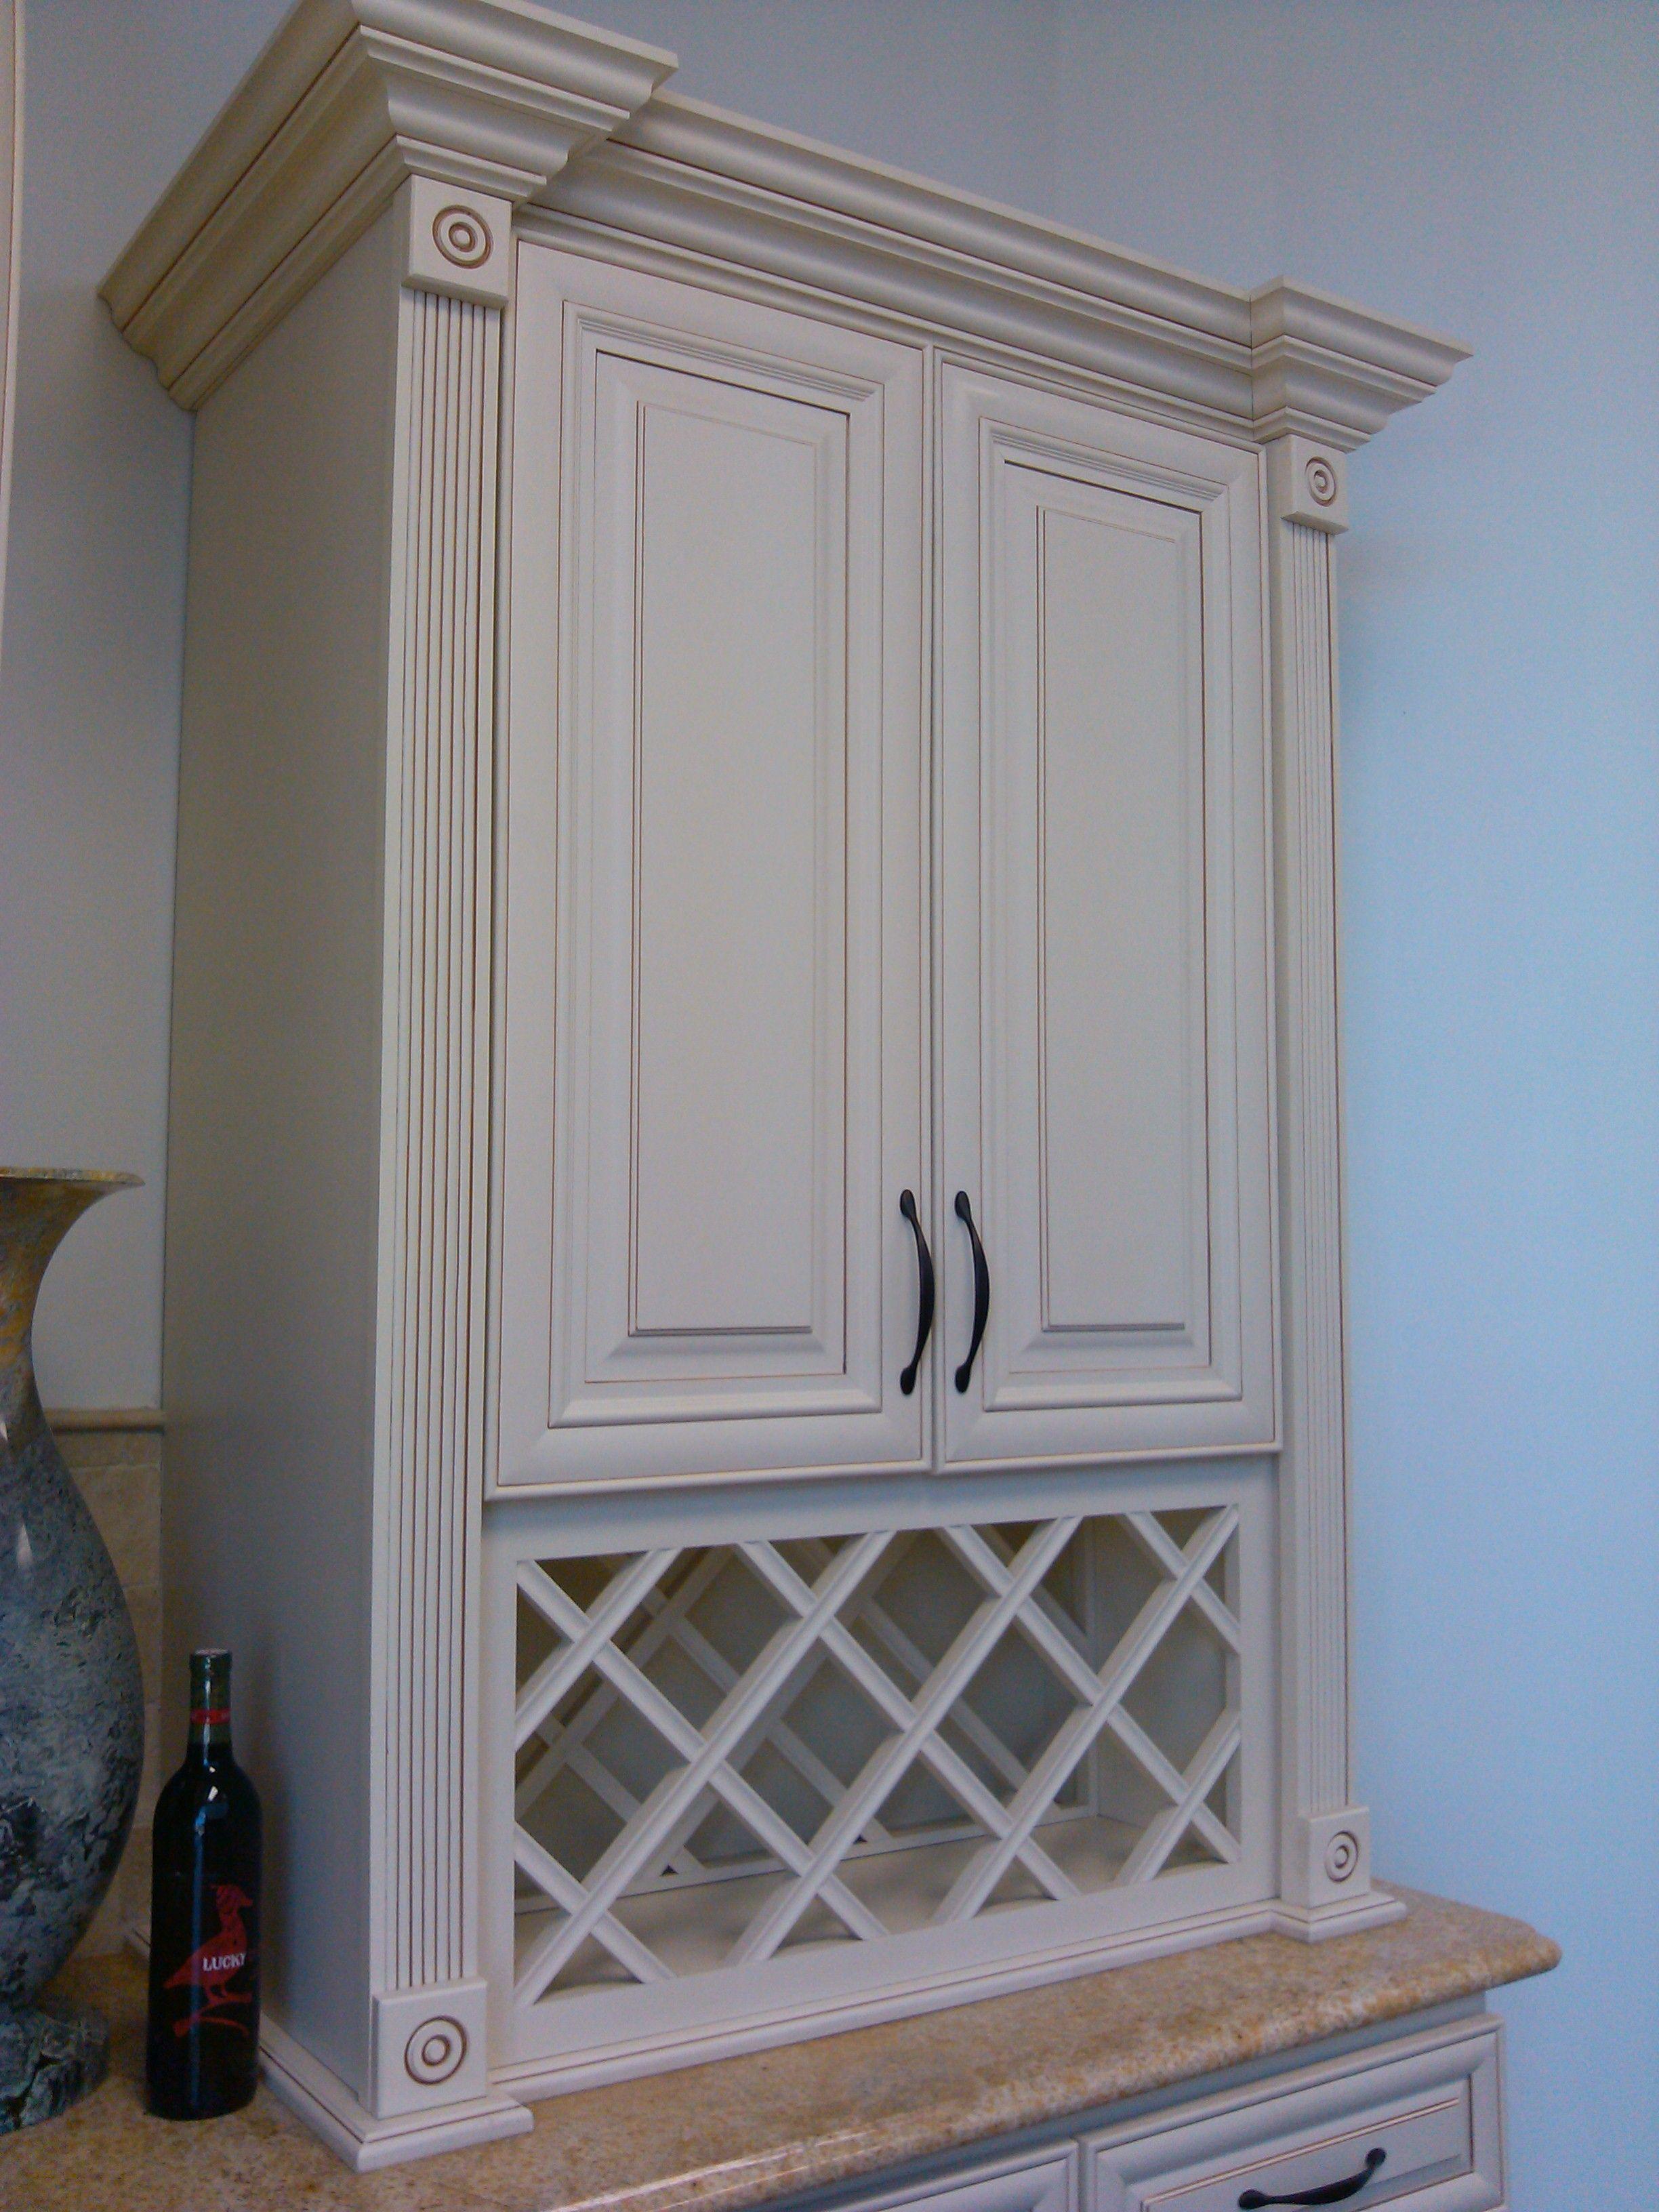 Cream Maple Glaze Rta Cabinets From Www Cabinetsdirectrta Com Rta Cabinets Maple Glaze Decor